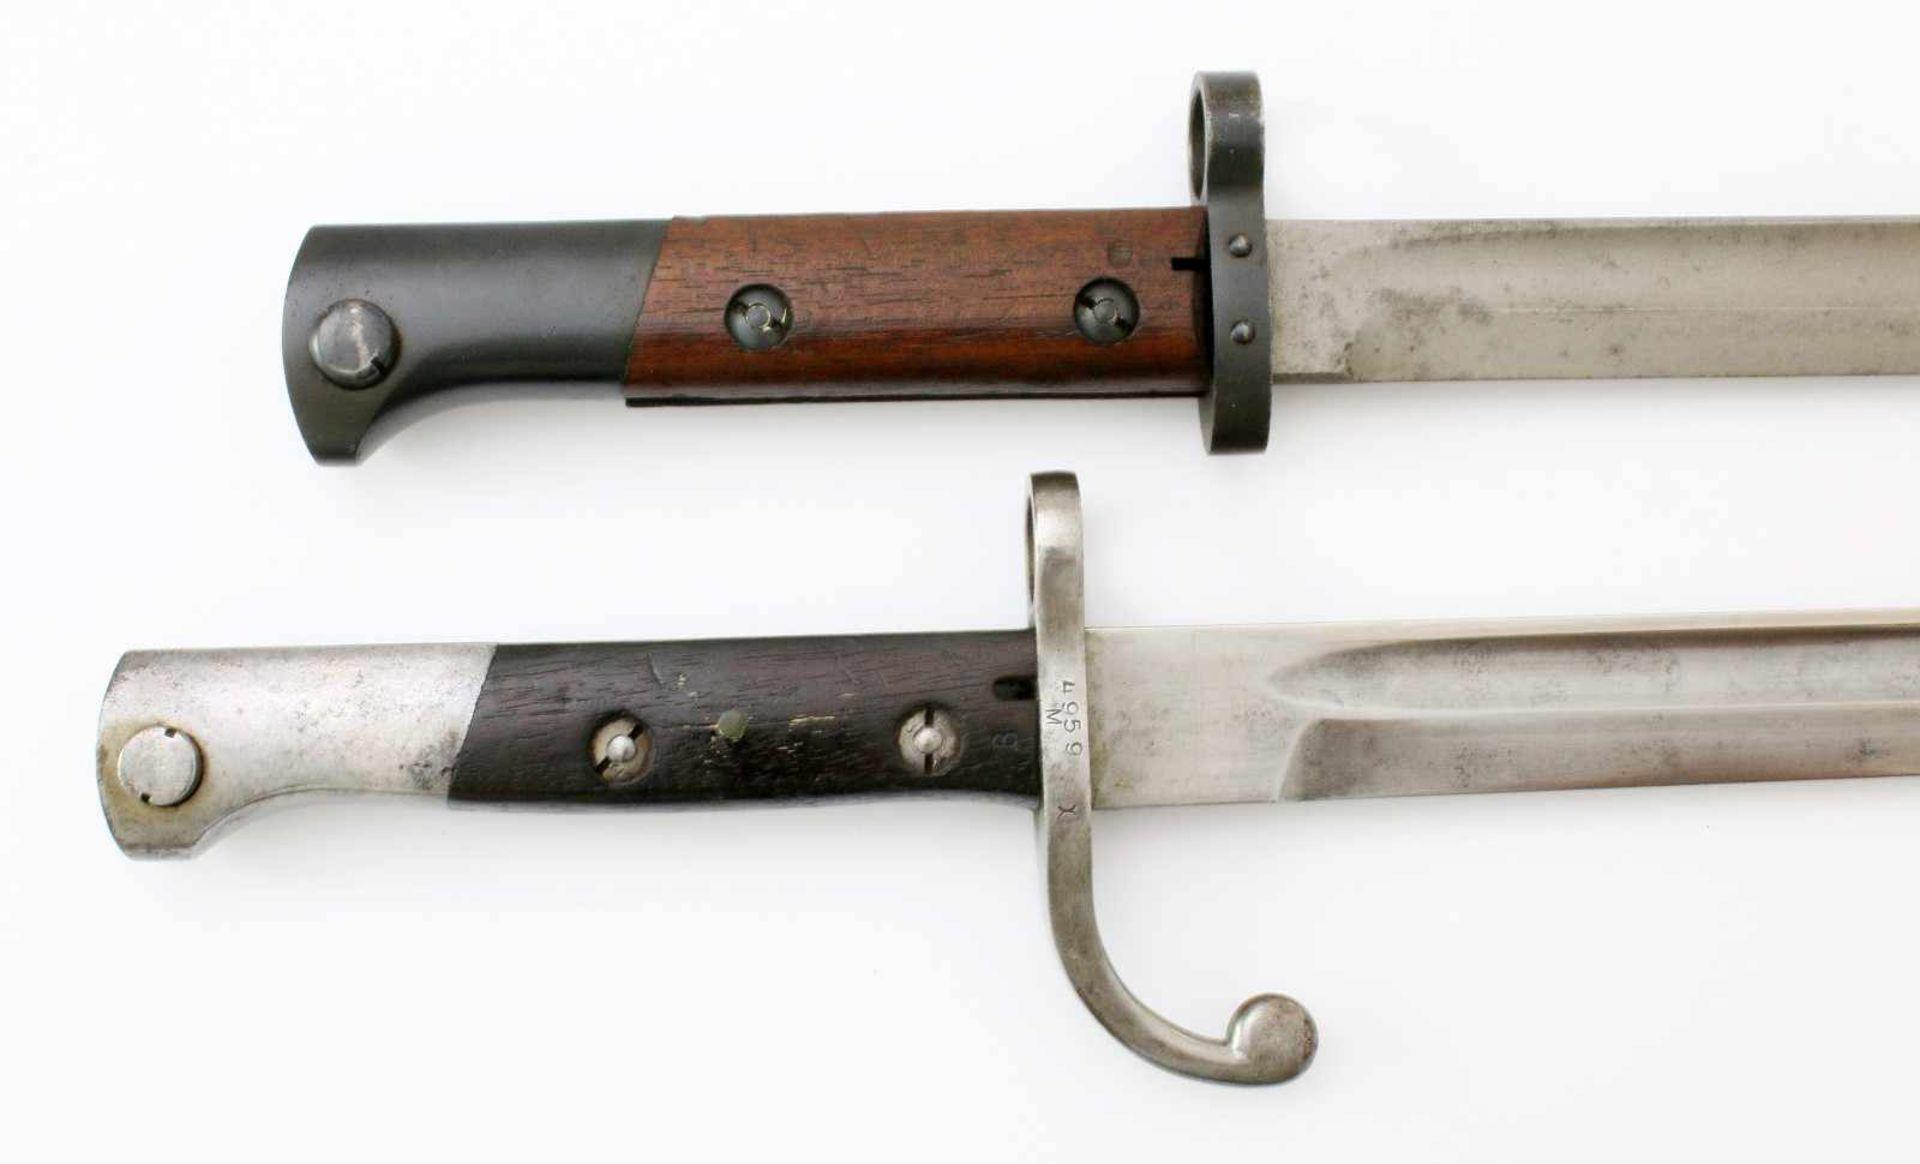 Brasilien / CSR - 2 Bajonette1x Bajonett M1908/34. Gekehlte Rückenklinge, Parier benummert, - Bild 3 aus 4